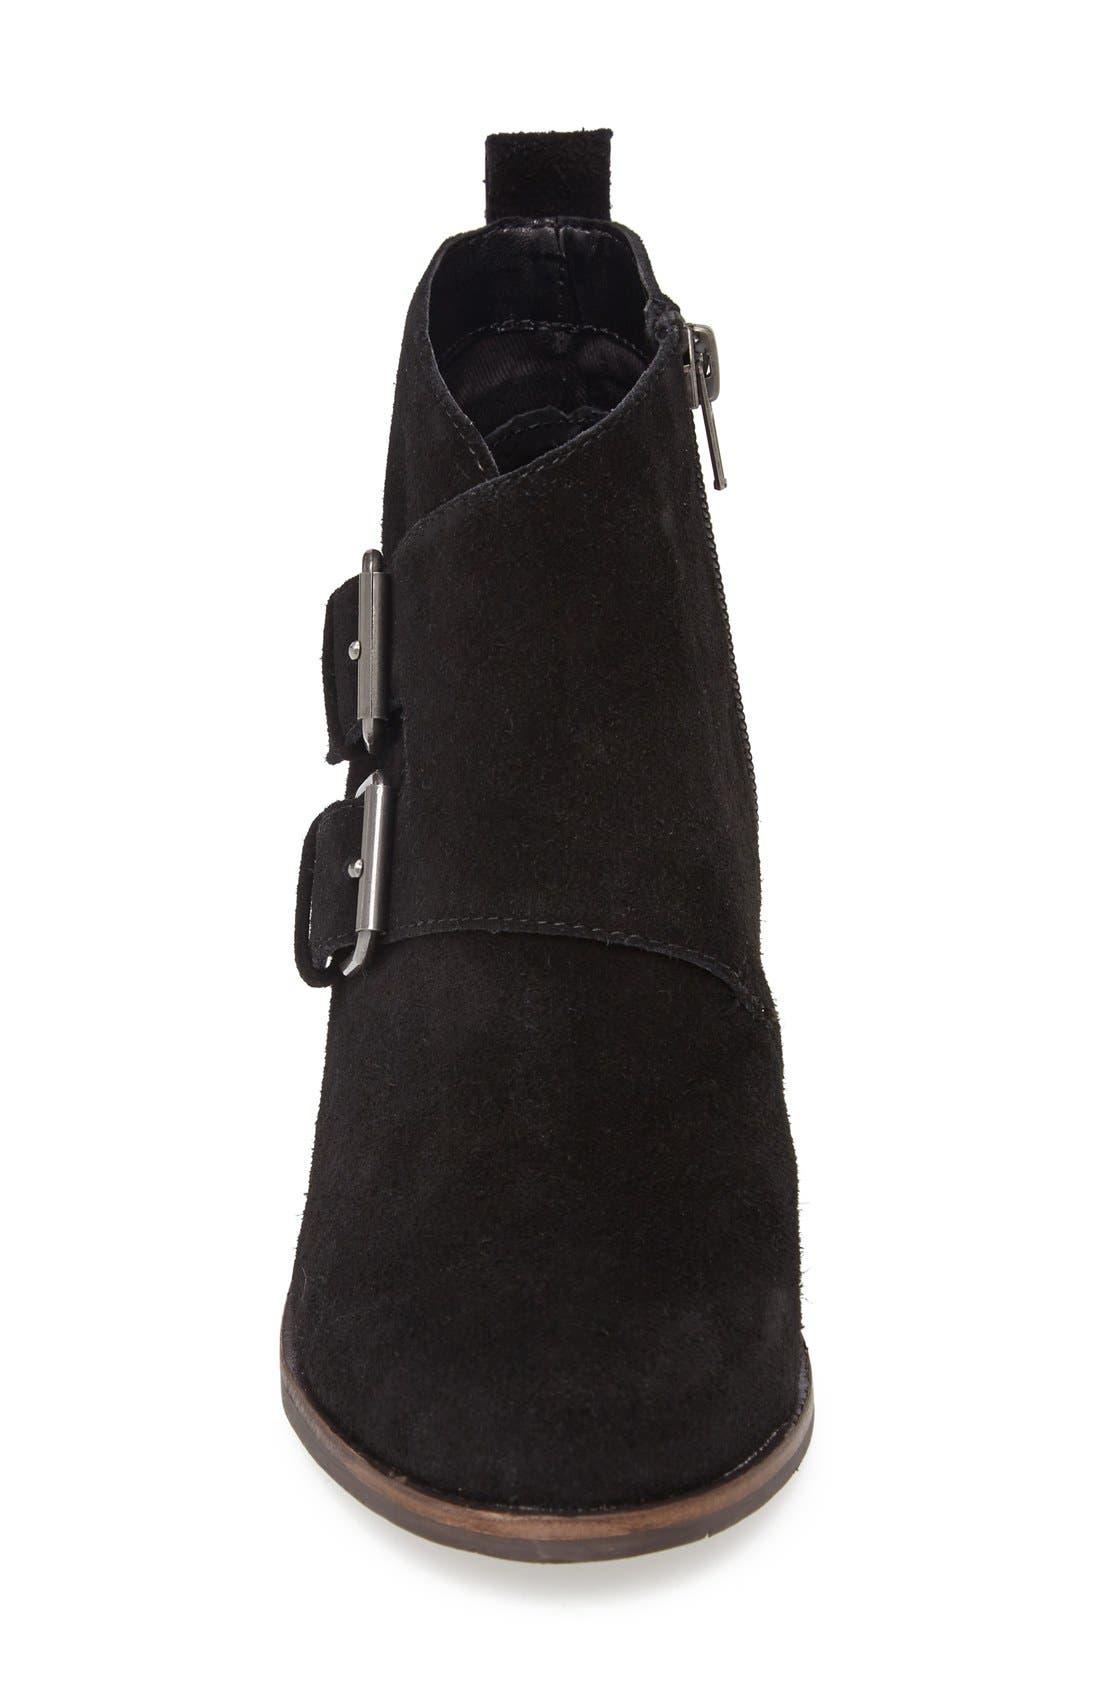 DV Footwear 'Fabian' Monk Strap Wedge Bootie,                             Alternate thumbnail 4, color,                             001